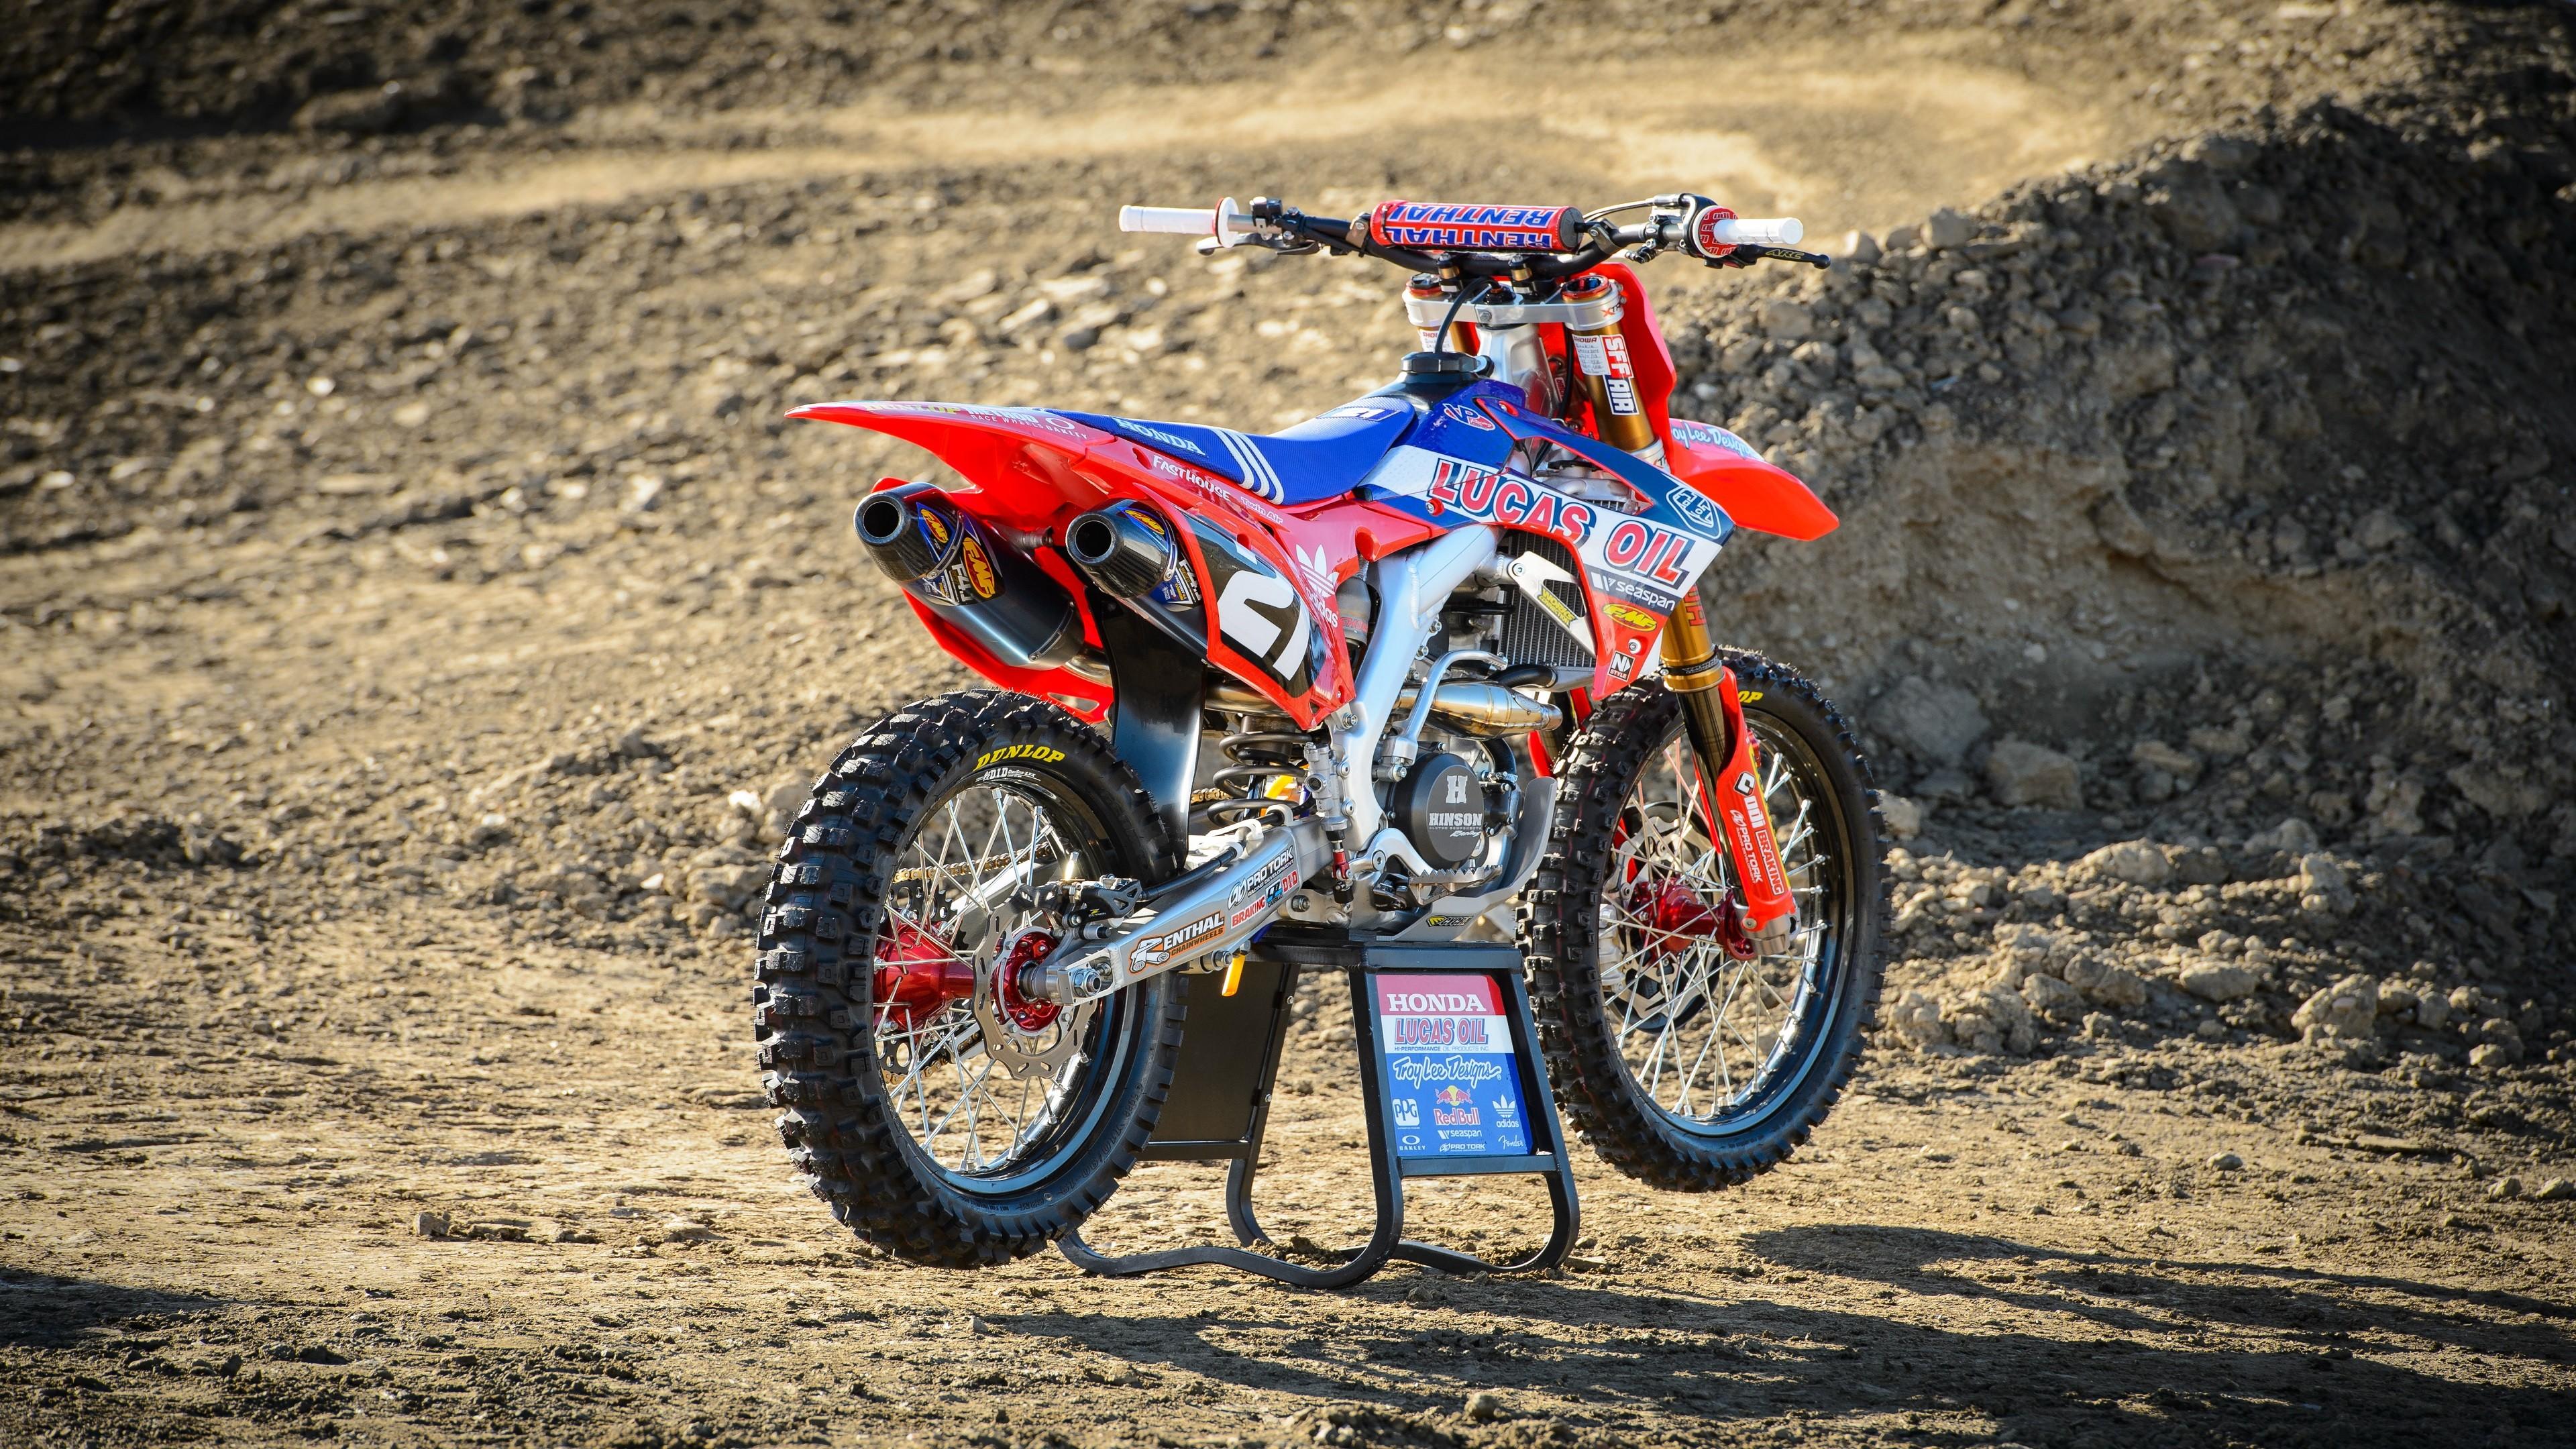 Sports Vehicle Honda Motocross Racing Motorsports Enduro Dirt Bikes Troy Lee Motorsport 3840x2160 Px Stunt Performer